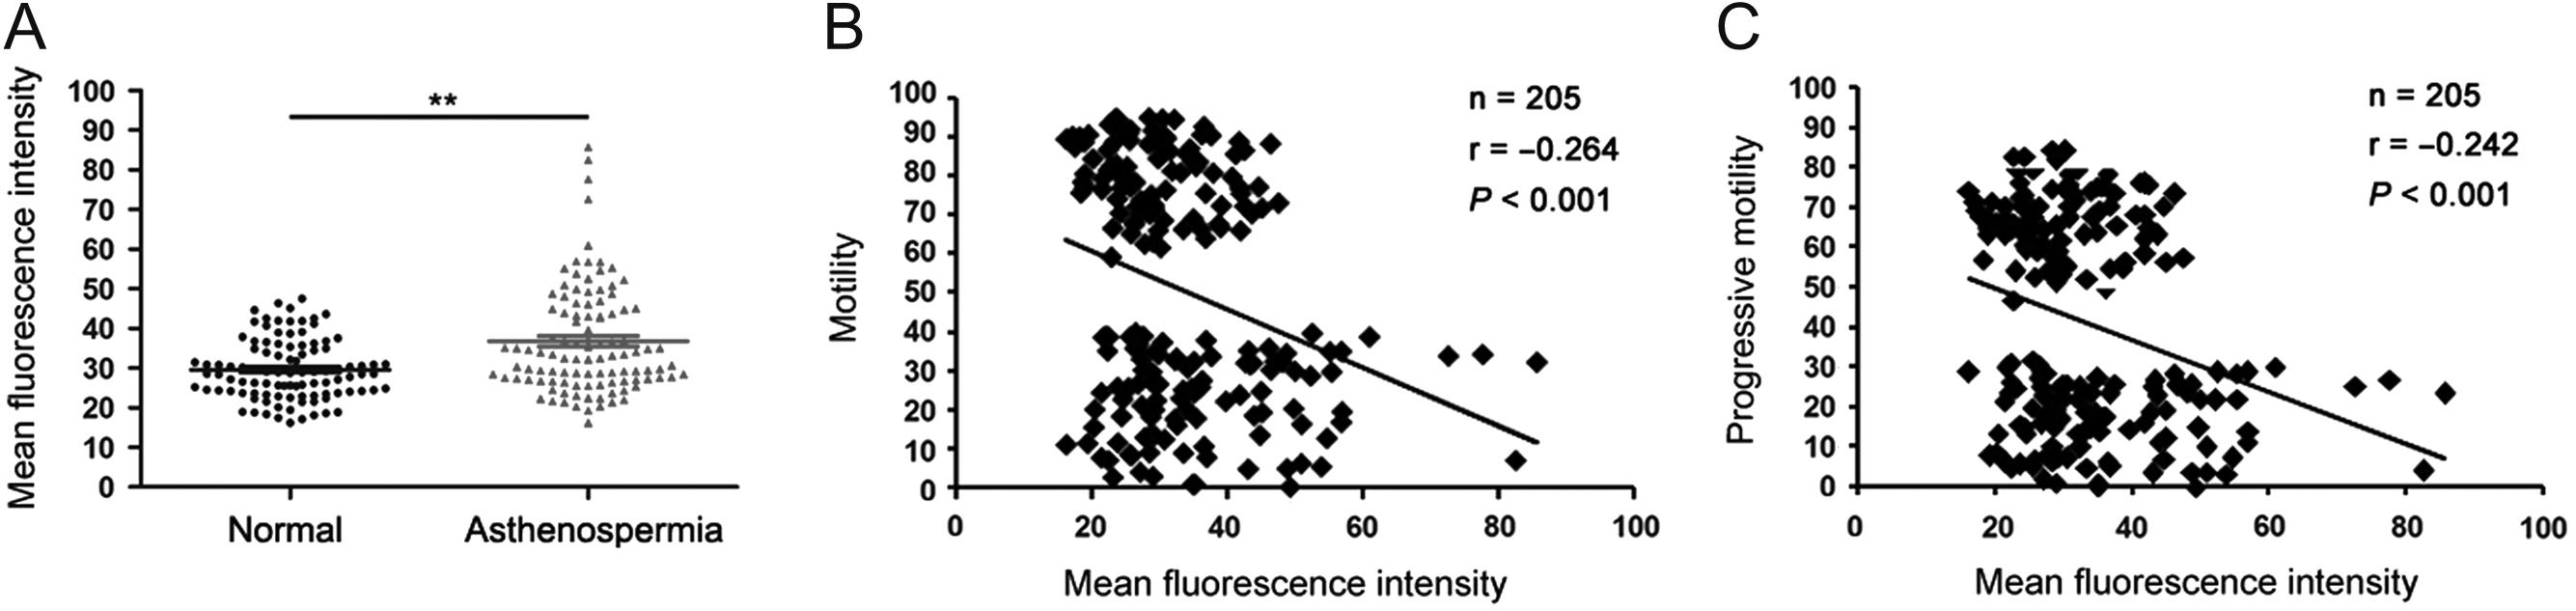 RNASET2 impairs the sperm motility via PKA/PI3K/calcium